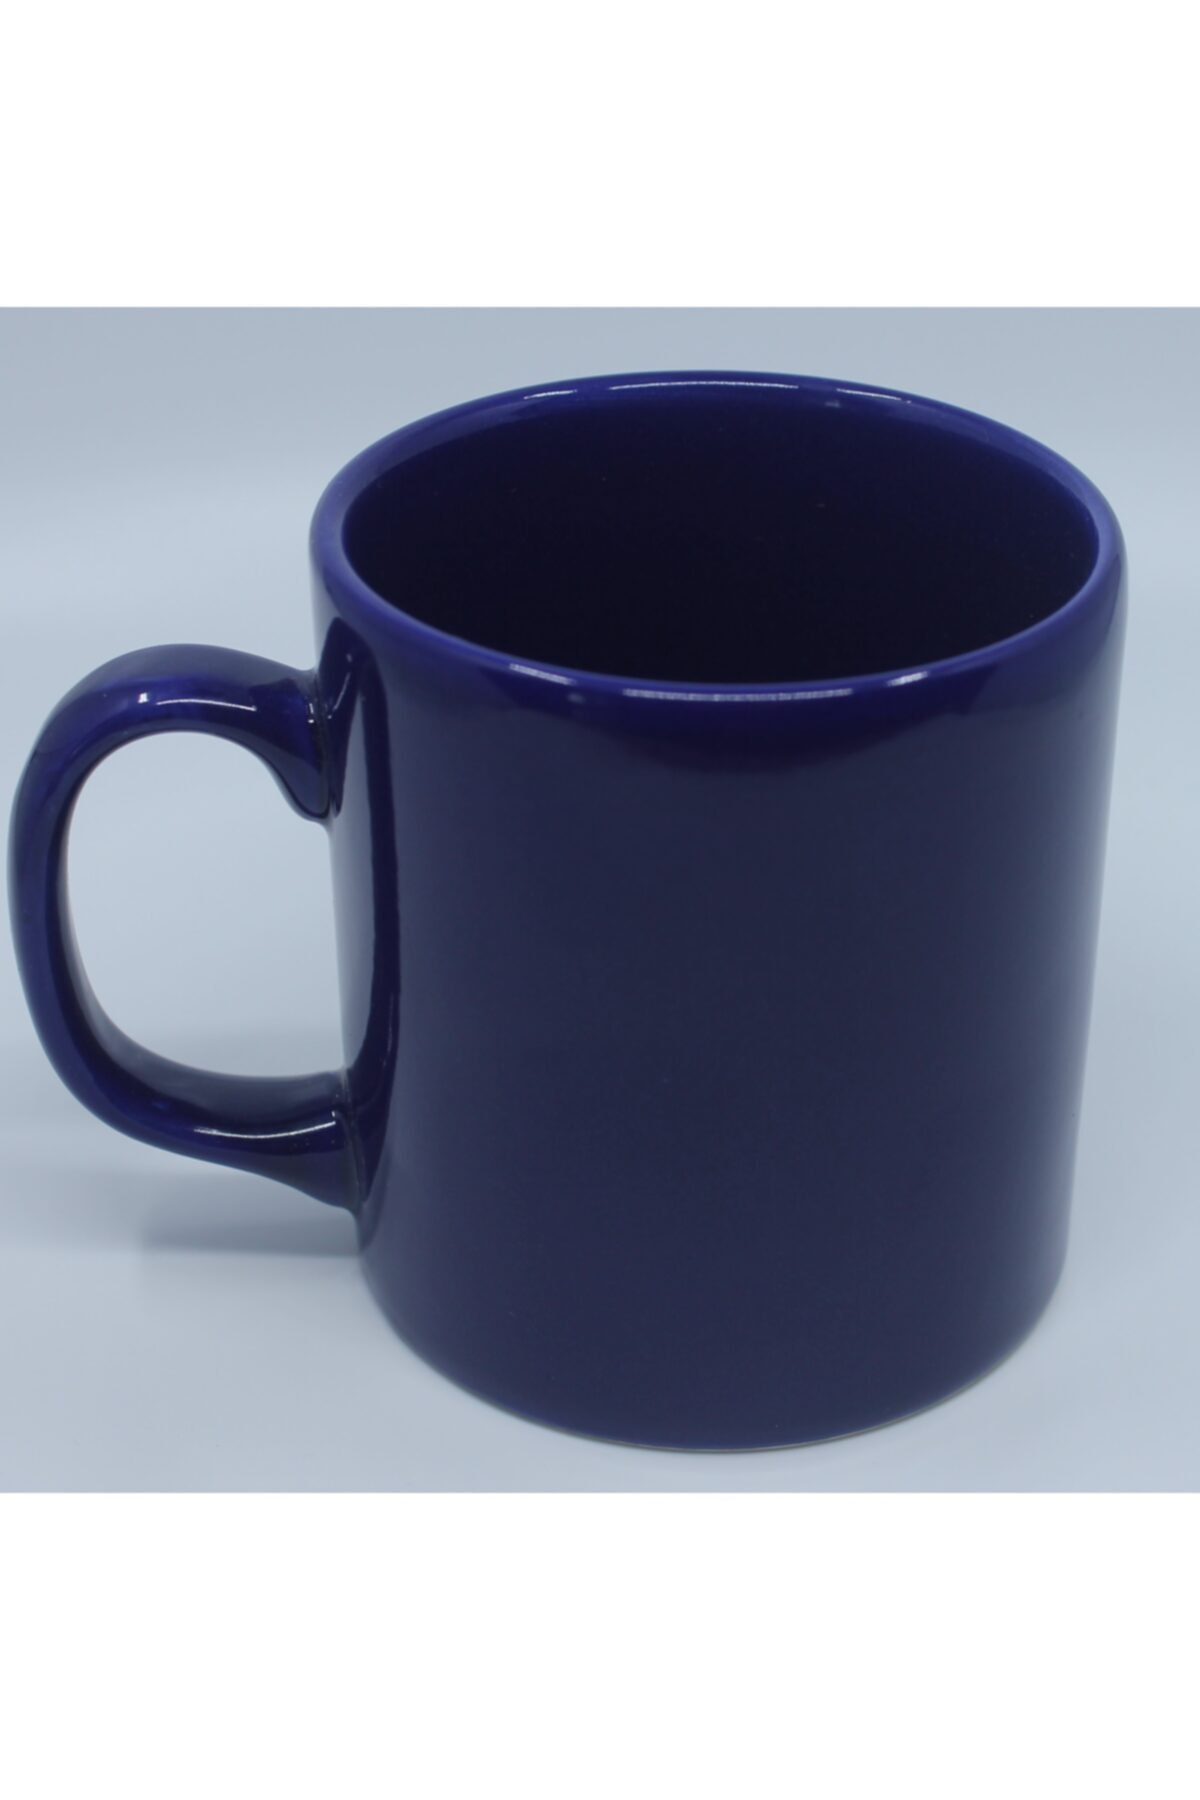 Keramika Silindirik Kupa Lacivert Tr200324fmx3a000000matv100 1